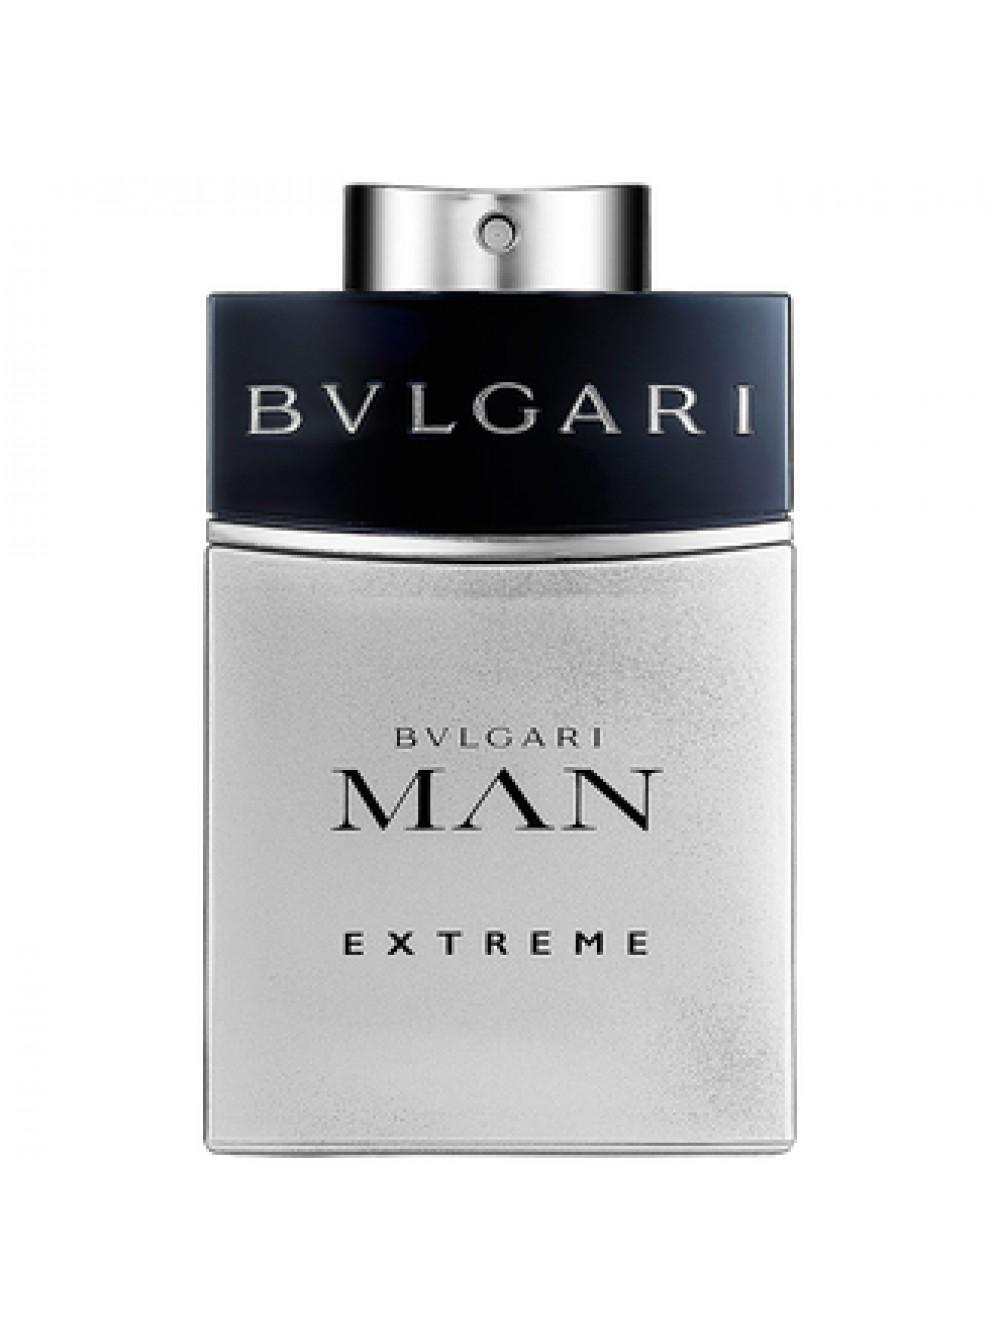 купить Bvlgari Man Extreme тестер туалетная вода 100 мл в интернет